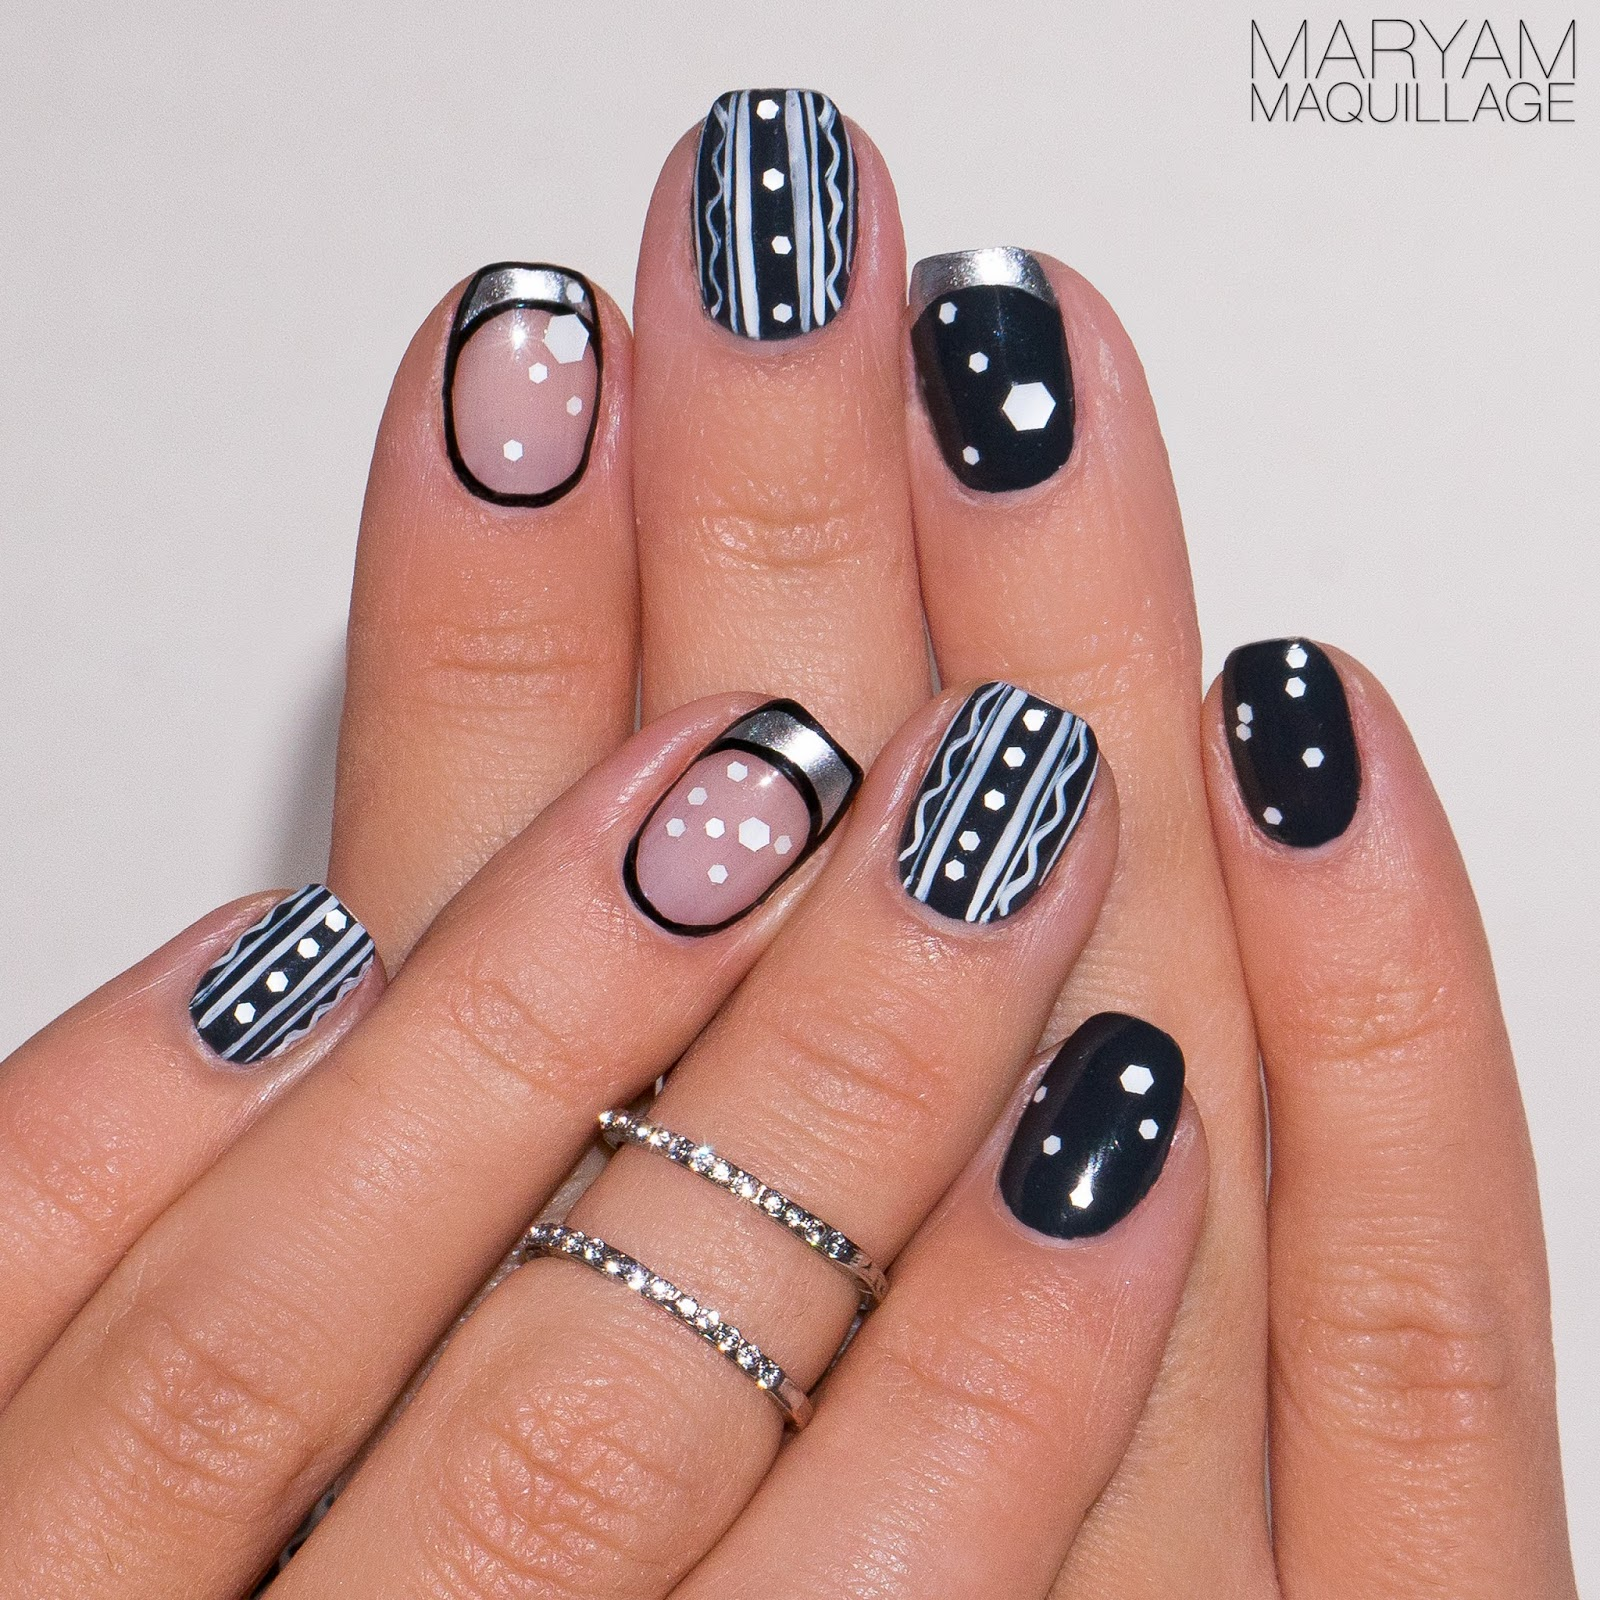 Winter Nail Art Designs: Maryam Maquillage: Nail Art: Winter-Theme